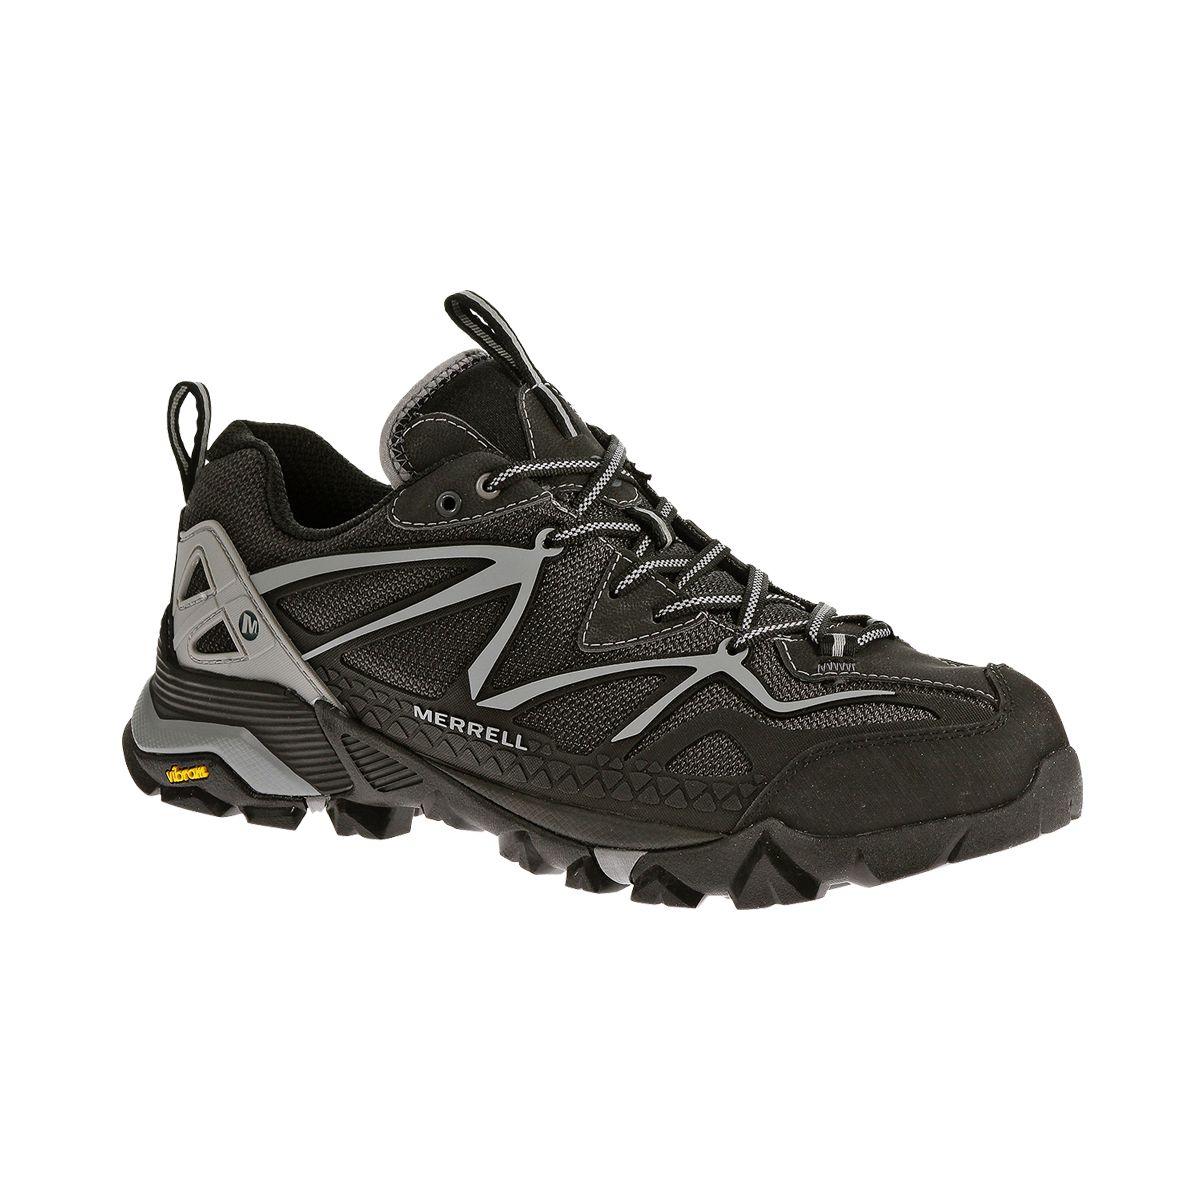 Merrell Capra Sport Hiking Shoes